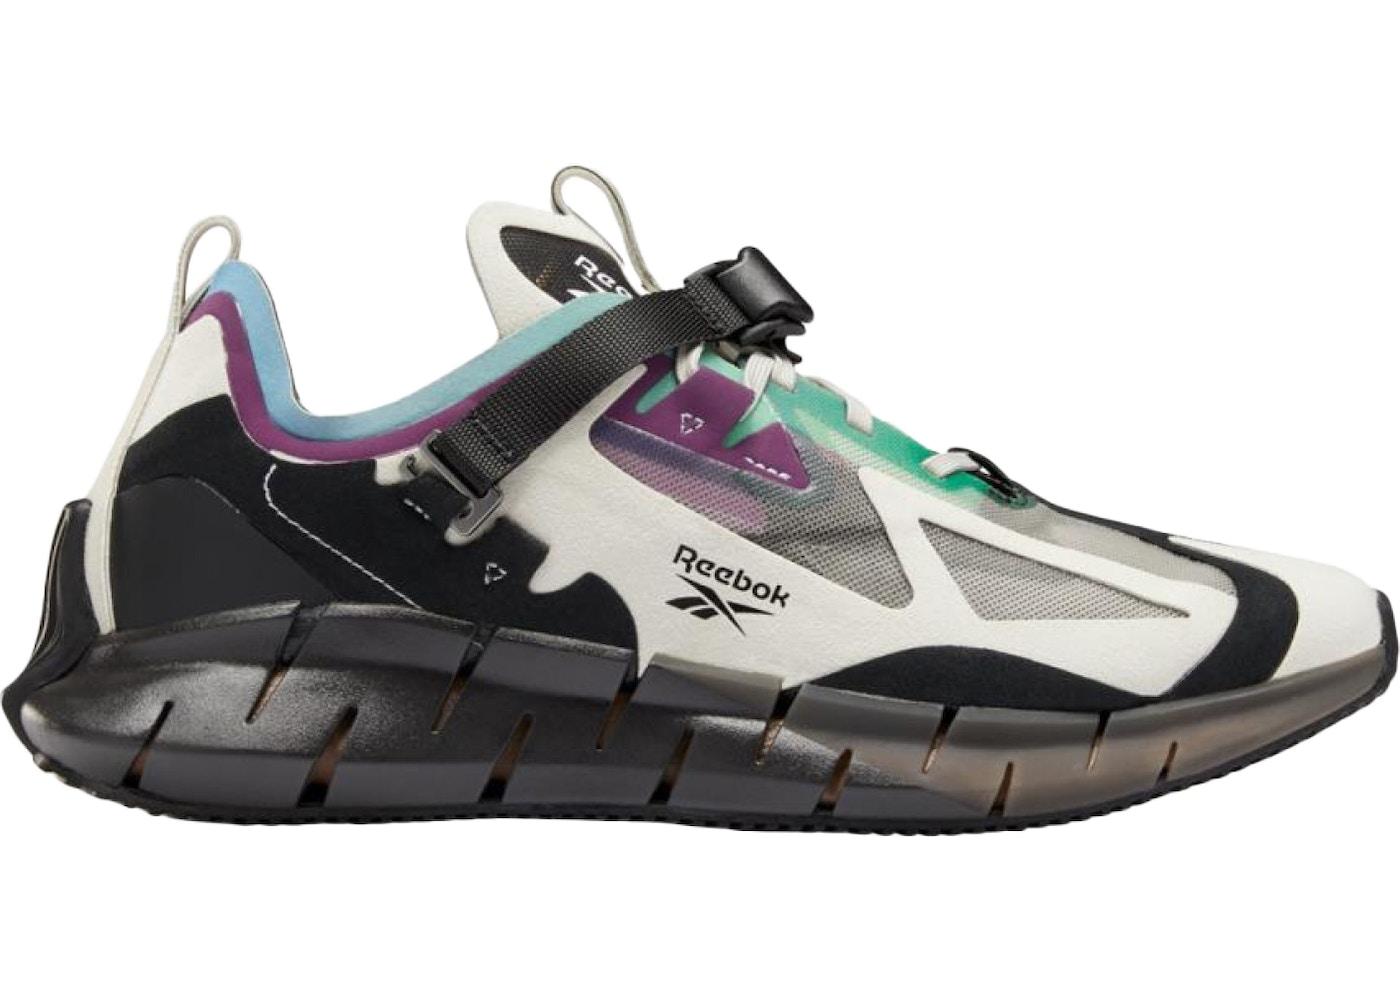 avance Mayor La oficina  Reebok Zig Kinetica Concept Type 1 White Black Purple Green - Sneakers